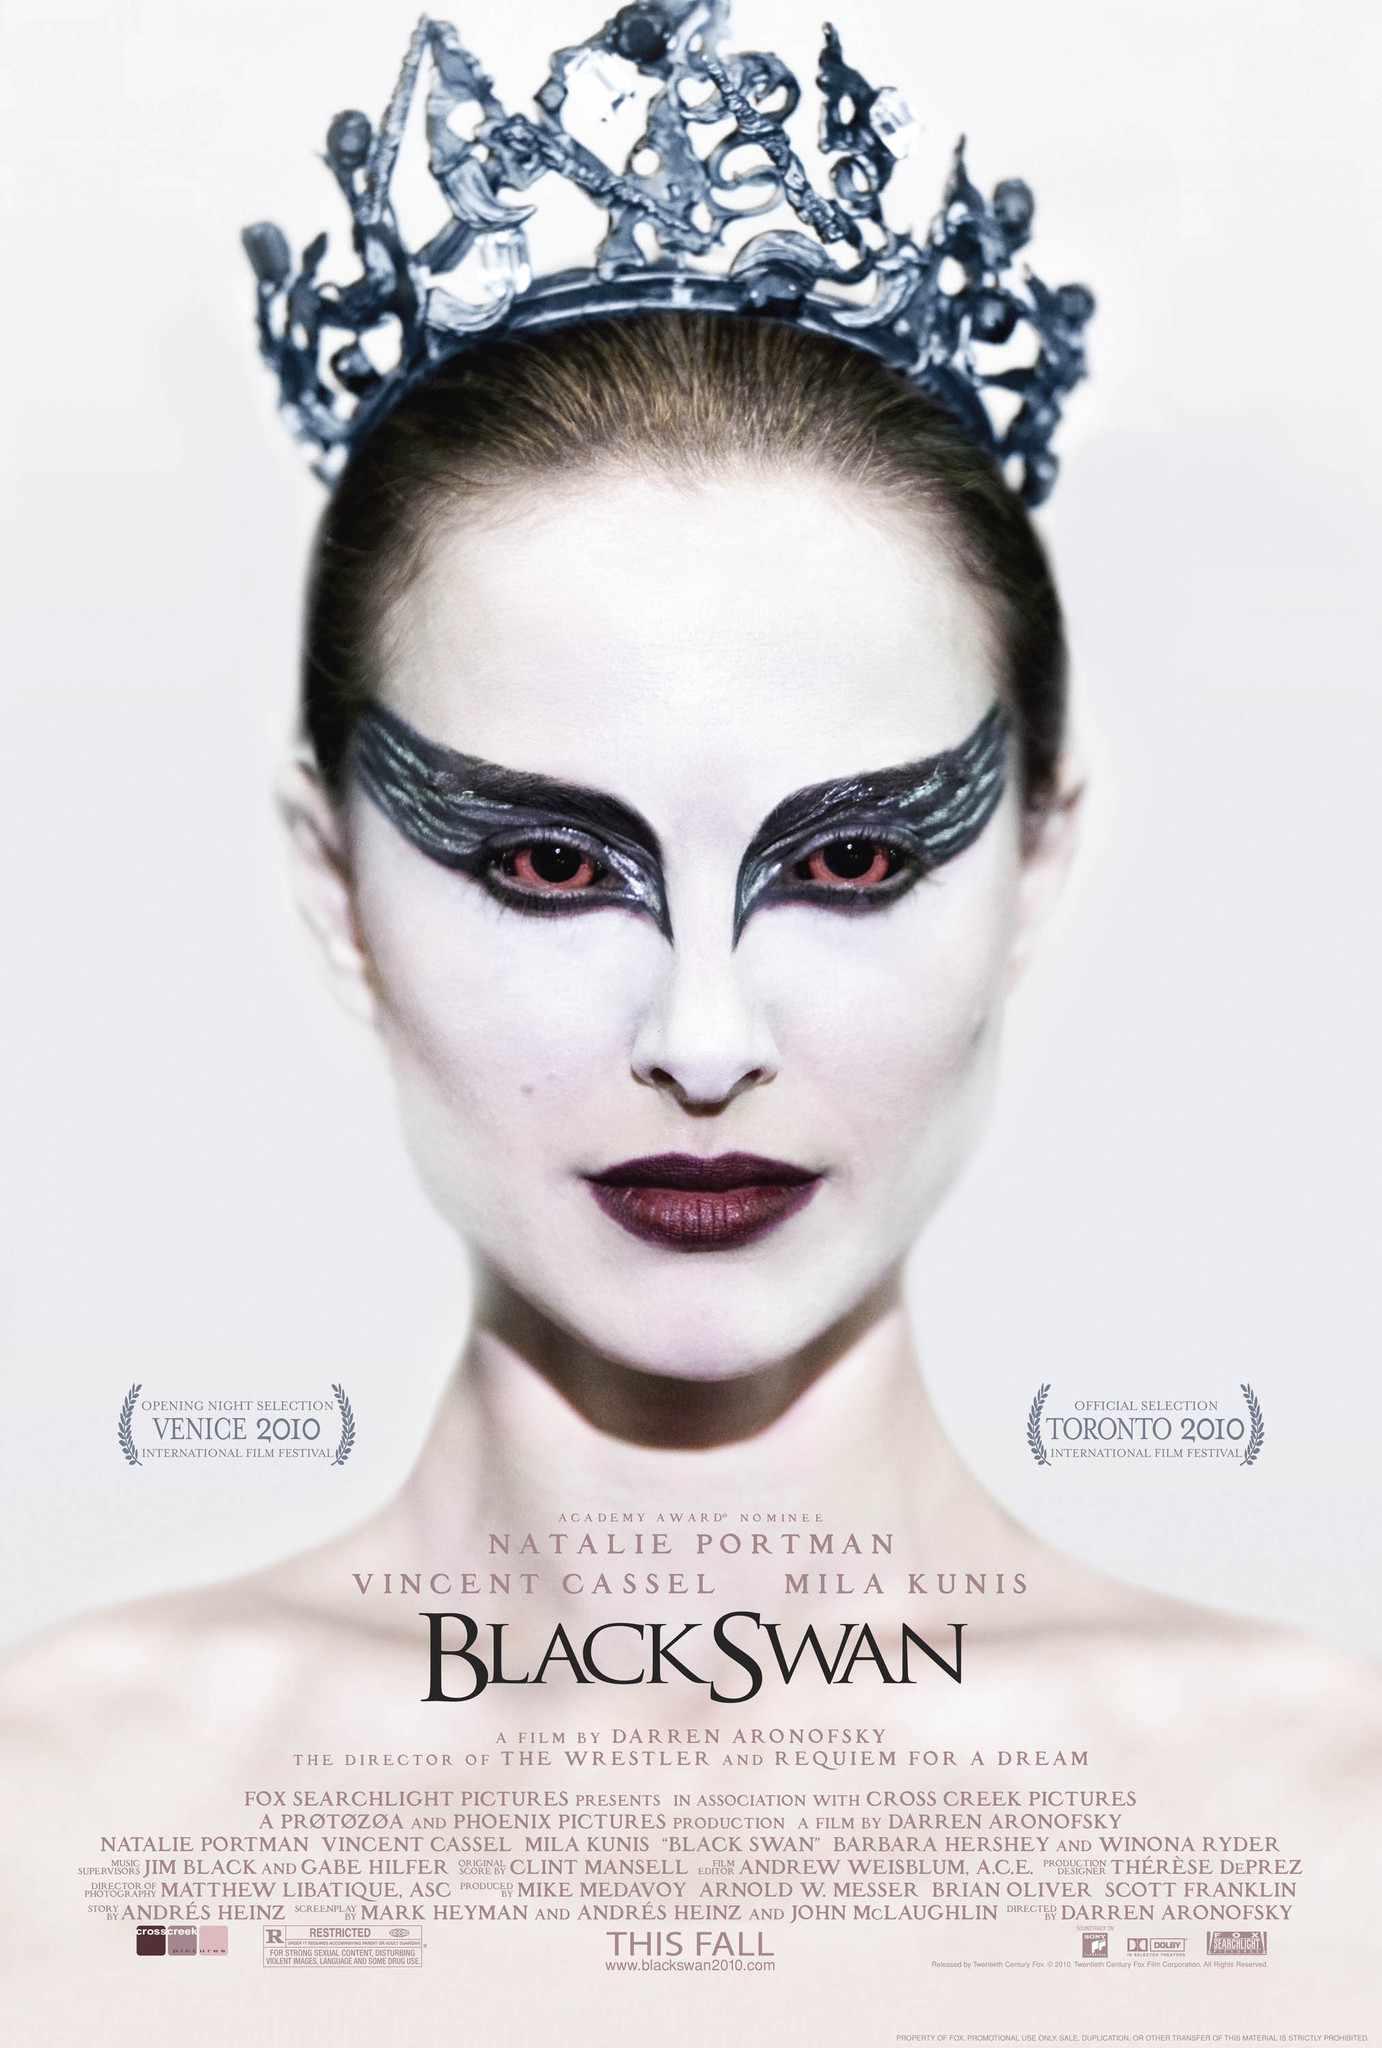 The psychological thriller movie, Black Swan.